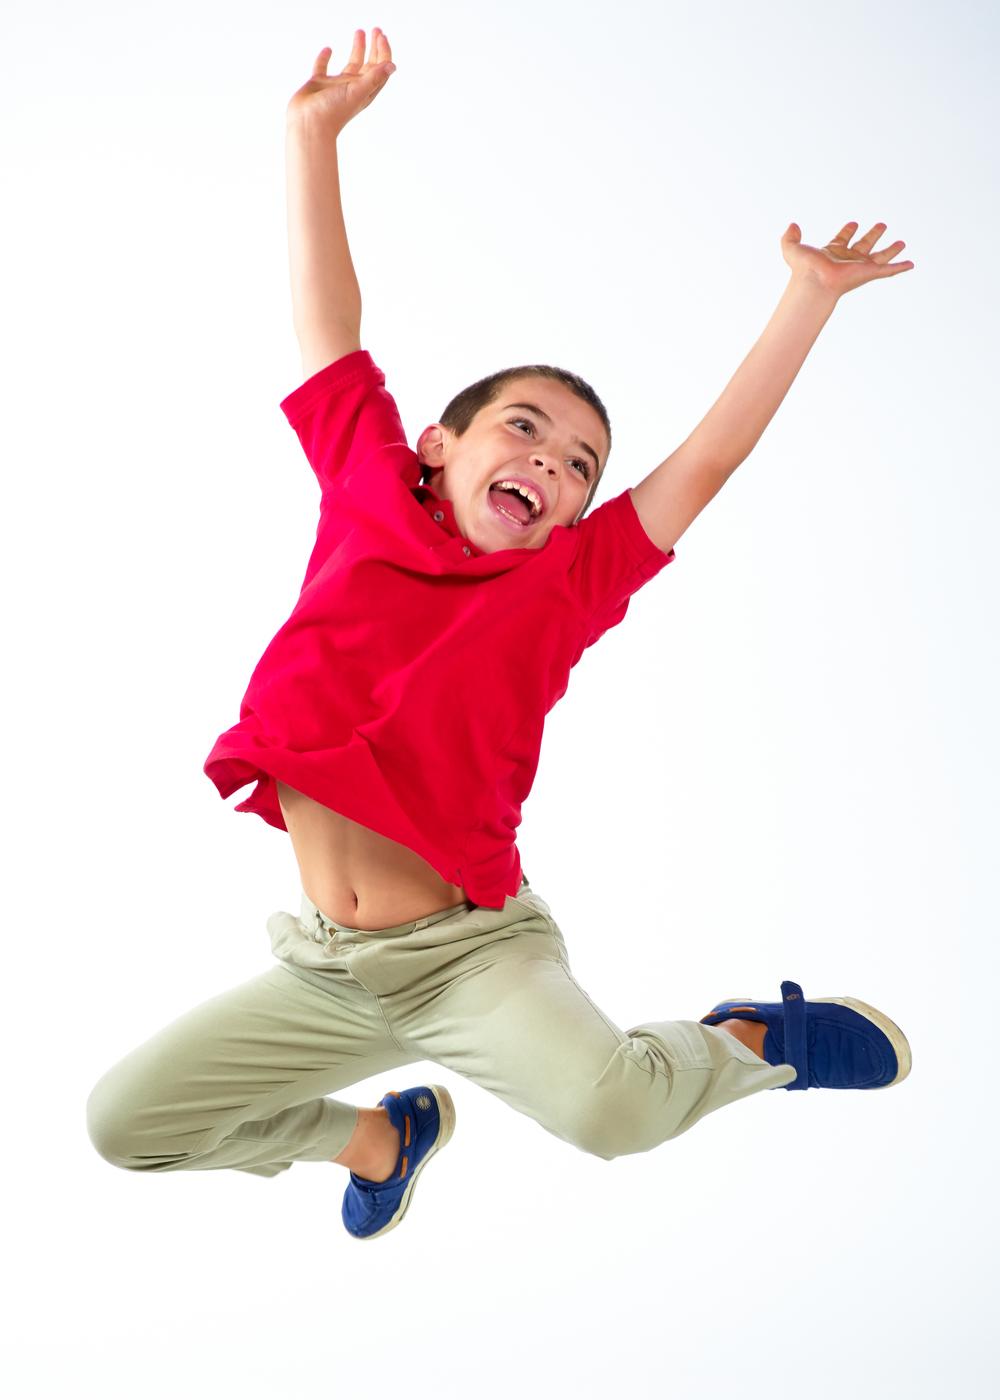 children's photographer, boy, photography, photographer, greenwich, darien, norwalk, stamford, rye, white plains